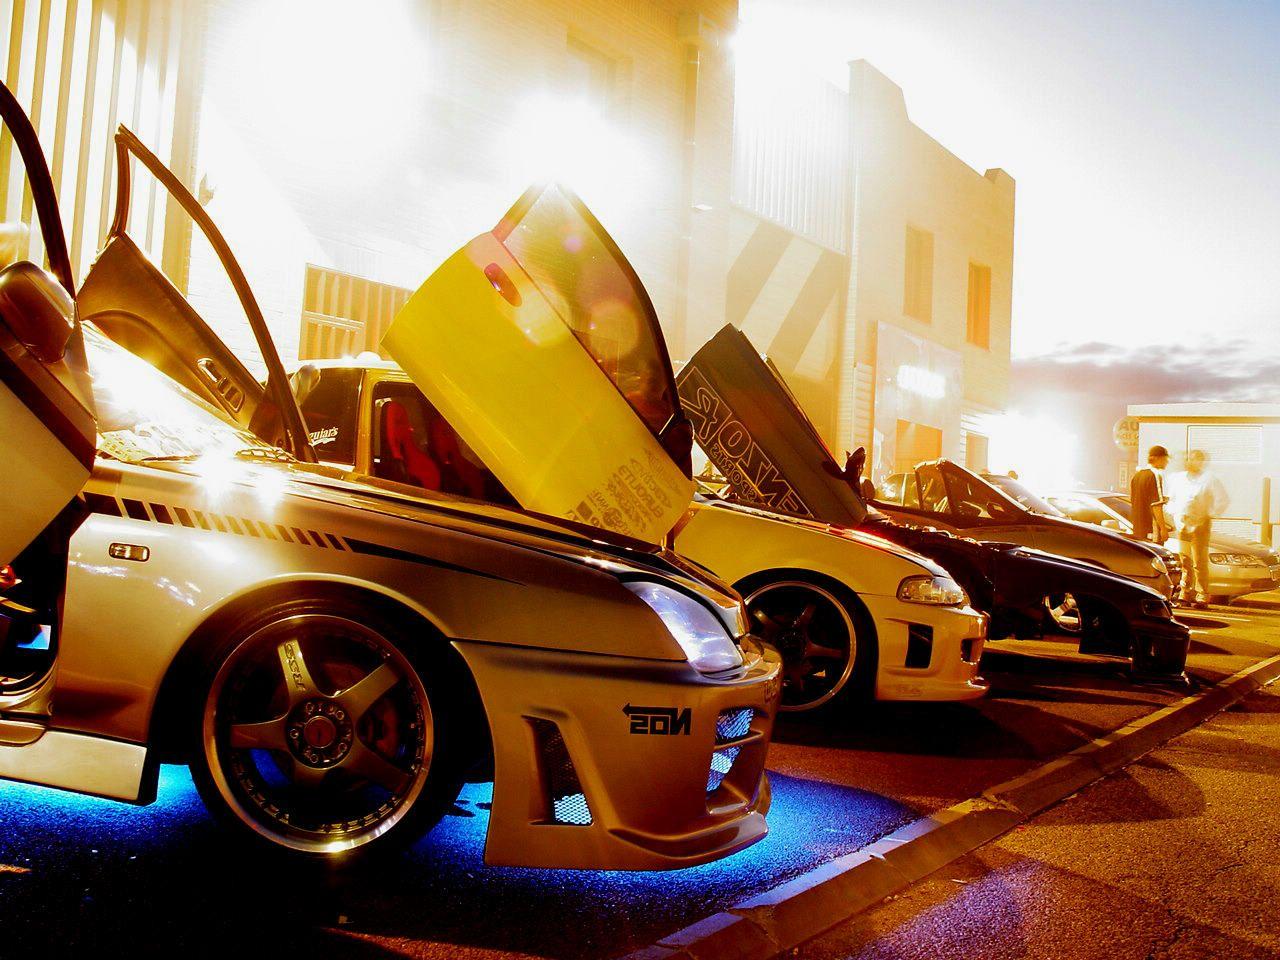 mundo dos carros wallpaper carros carros papel de parede 3. Black Bedroom Furniture Sets. Home Design Ideas